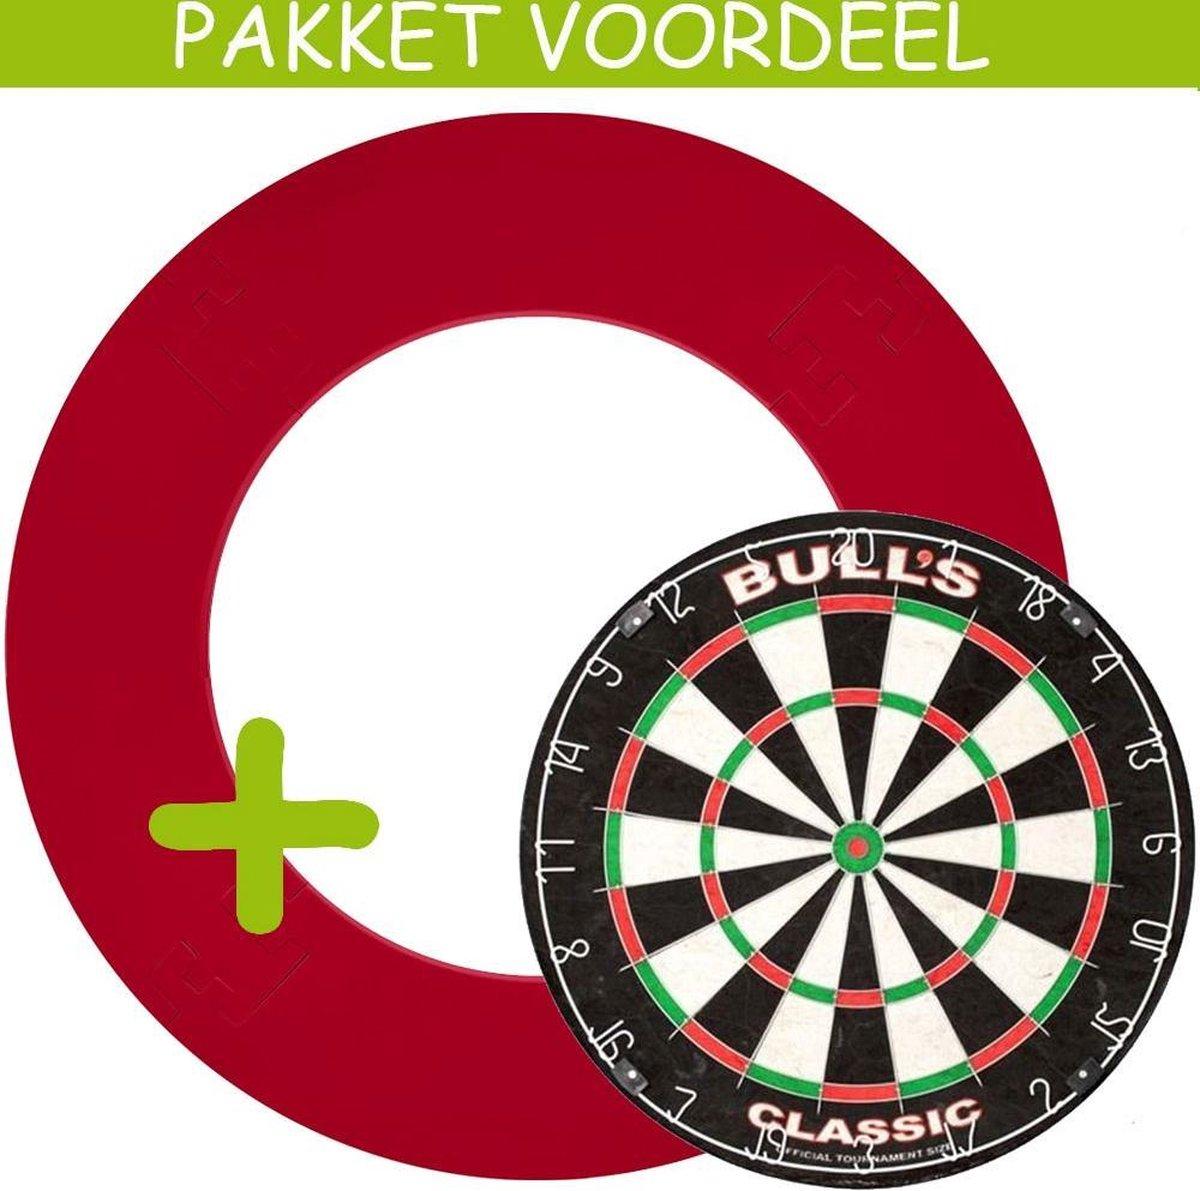 Dartbord Surround VoordeelPakket - Bulls Classic - EVA Surround-- (Rood)